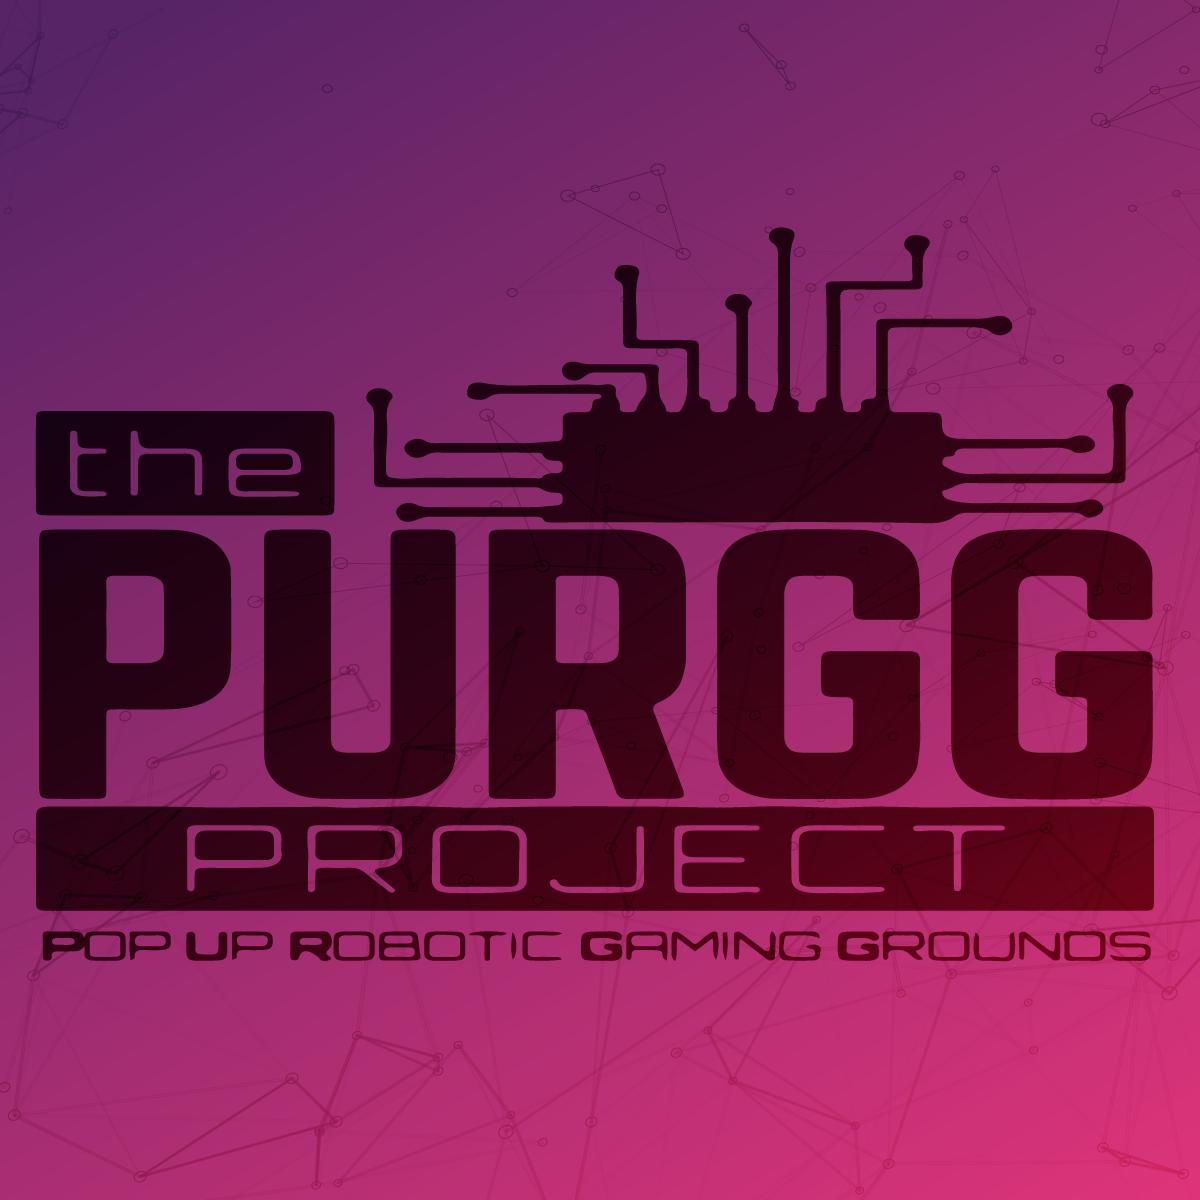 purgg-flier-1200x1200